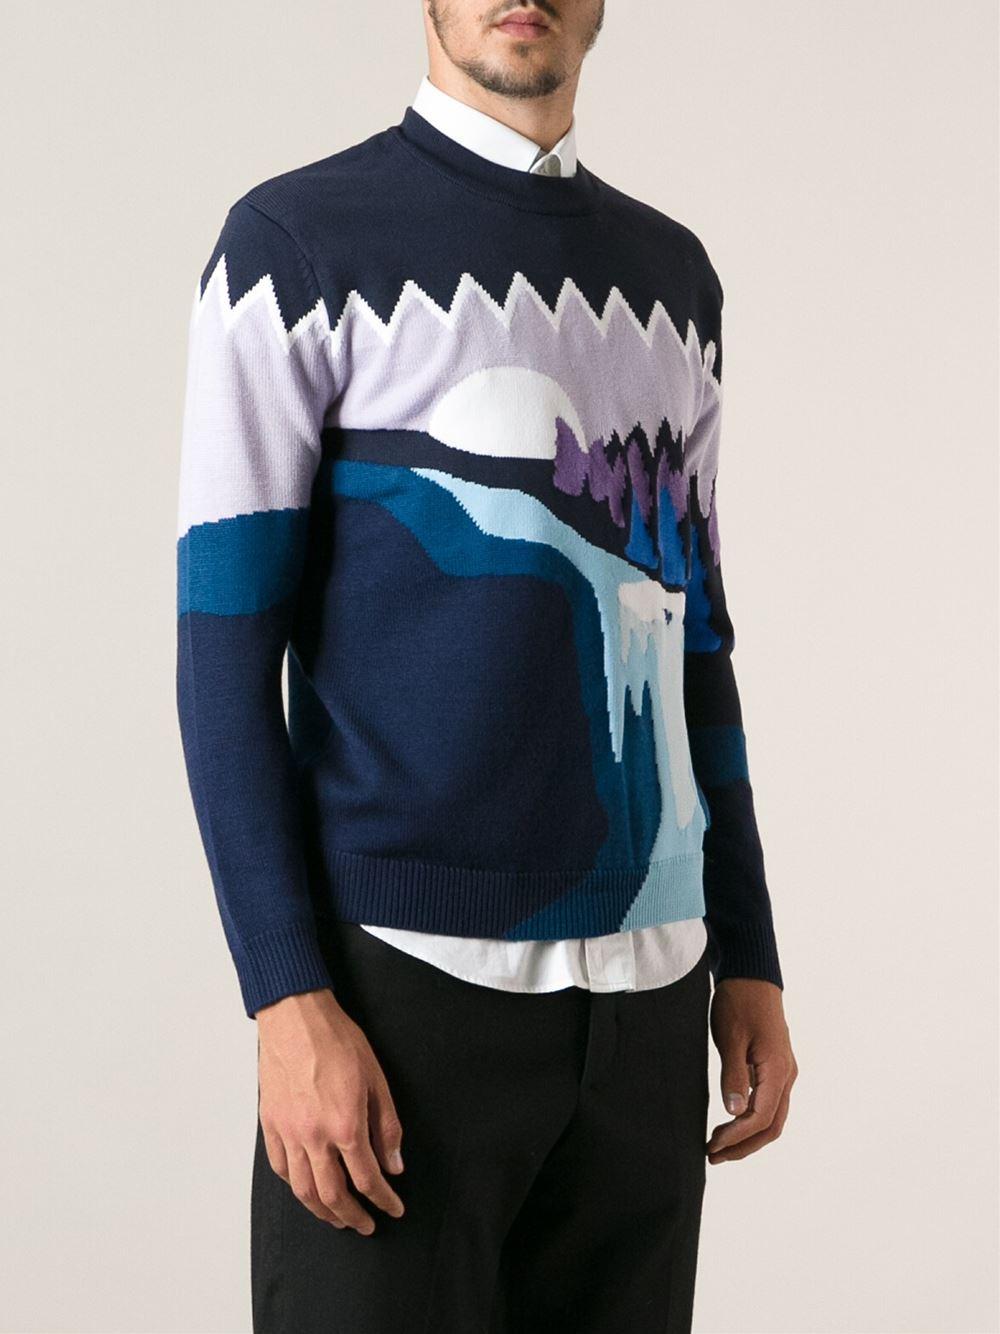 kenzo 39 landscape 39 intarsia sweater in blue for men lyst. Black Bedroom Furniture Sets. Home Design Ideas